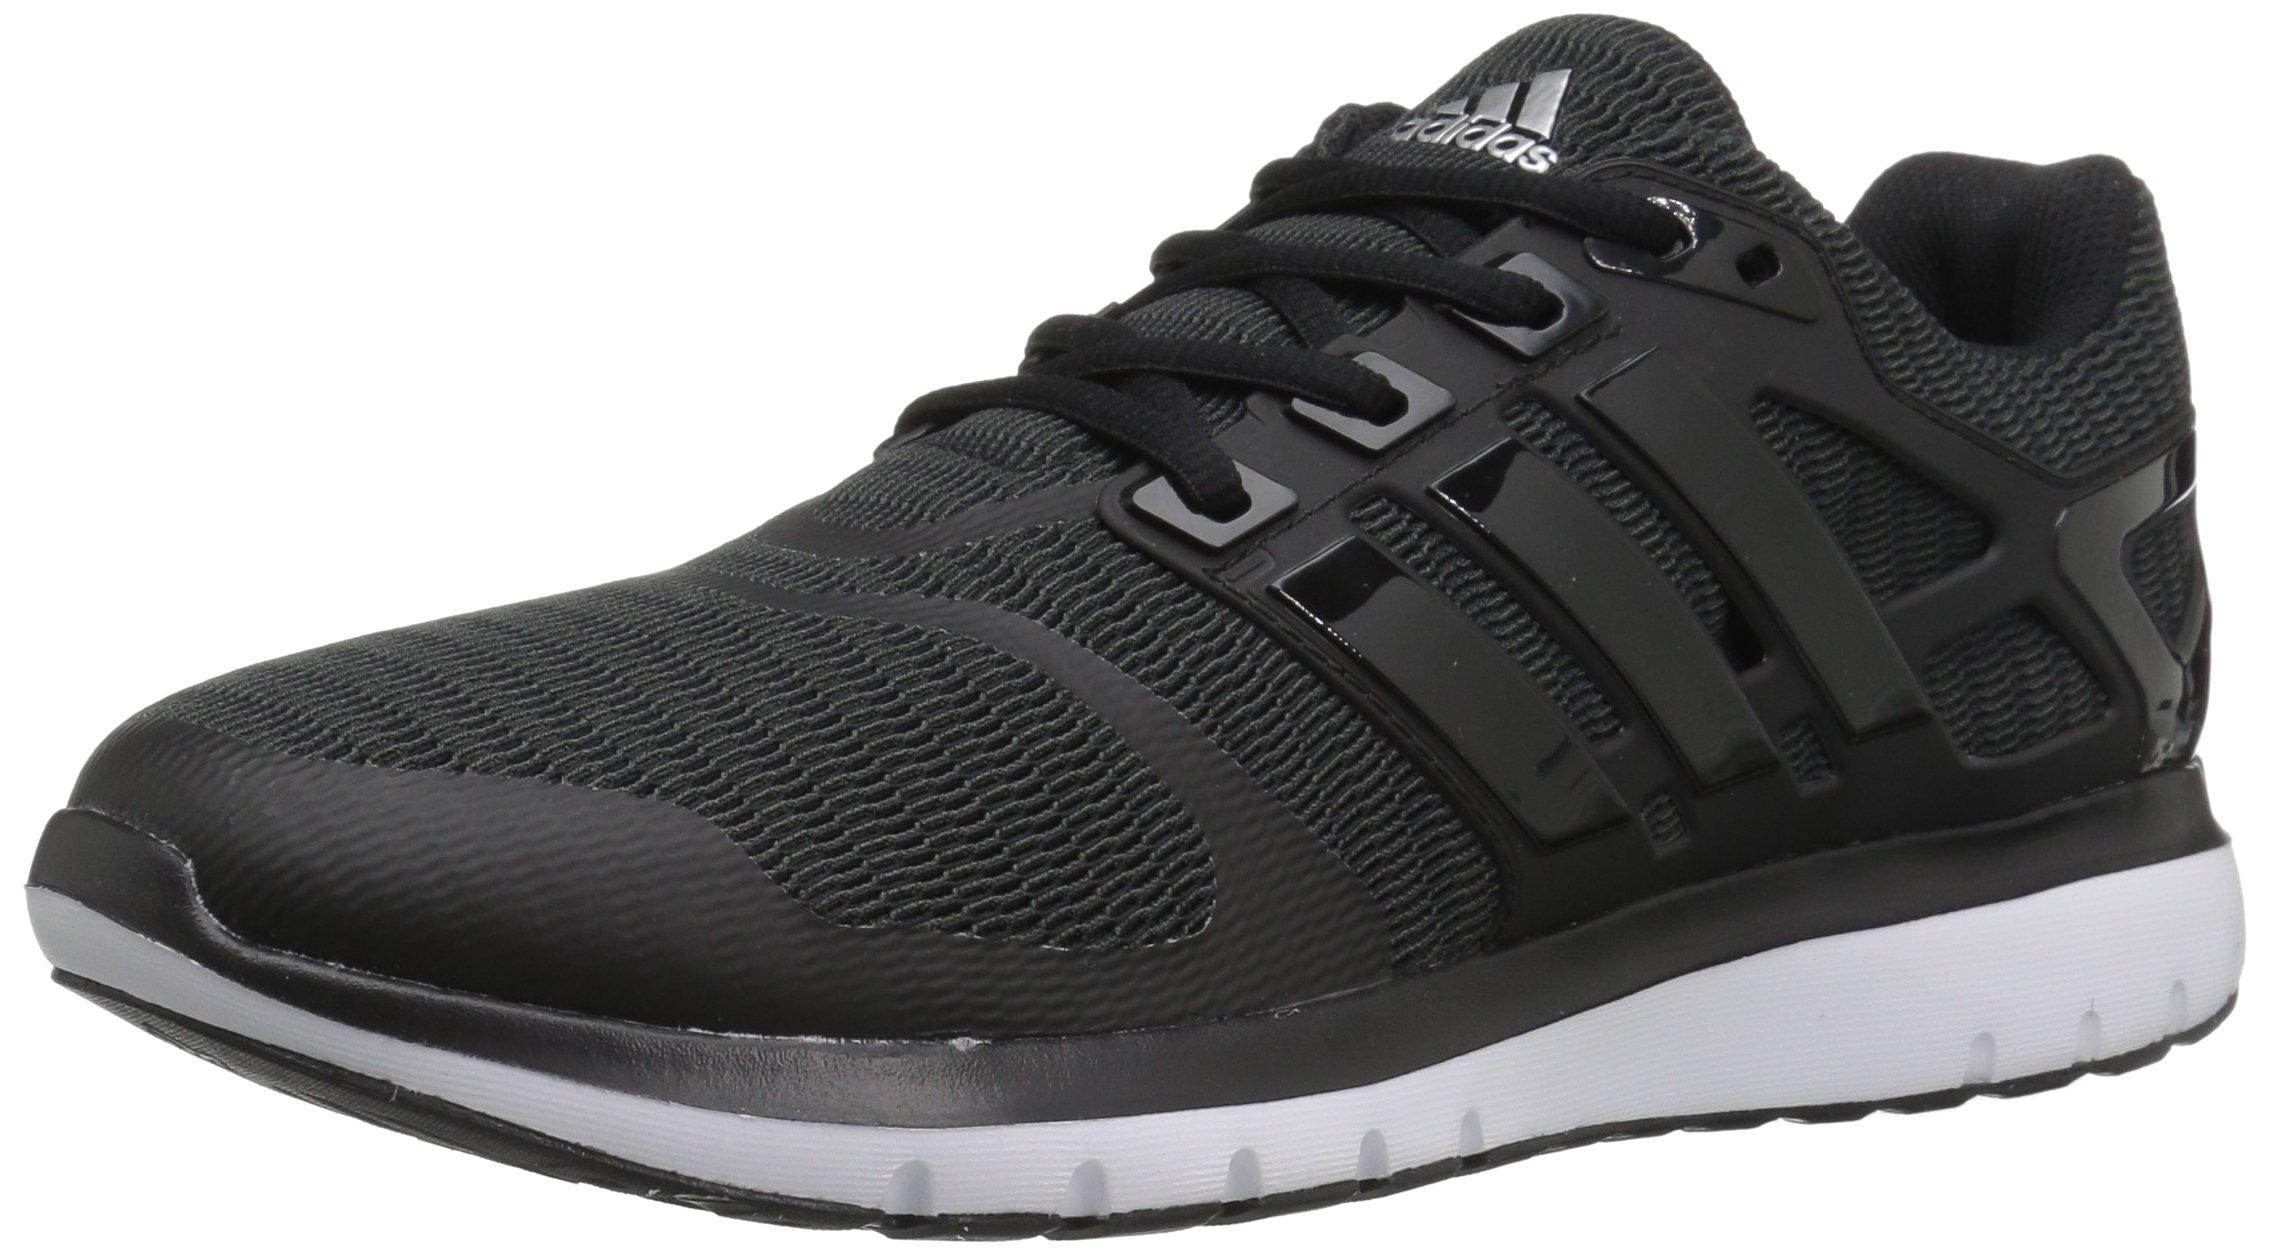 adidas Women's Energy Cloud V Running Shoe, Black/Black/Dark Grey Heather, 9 M US